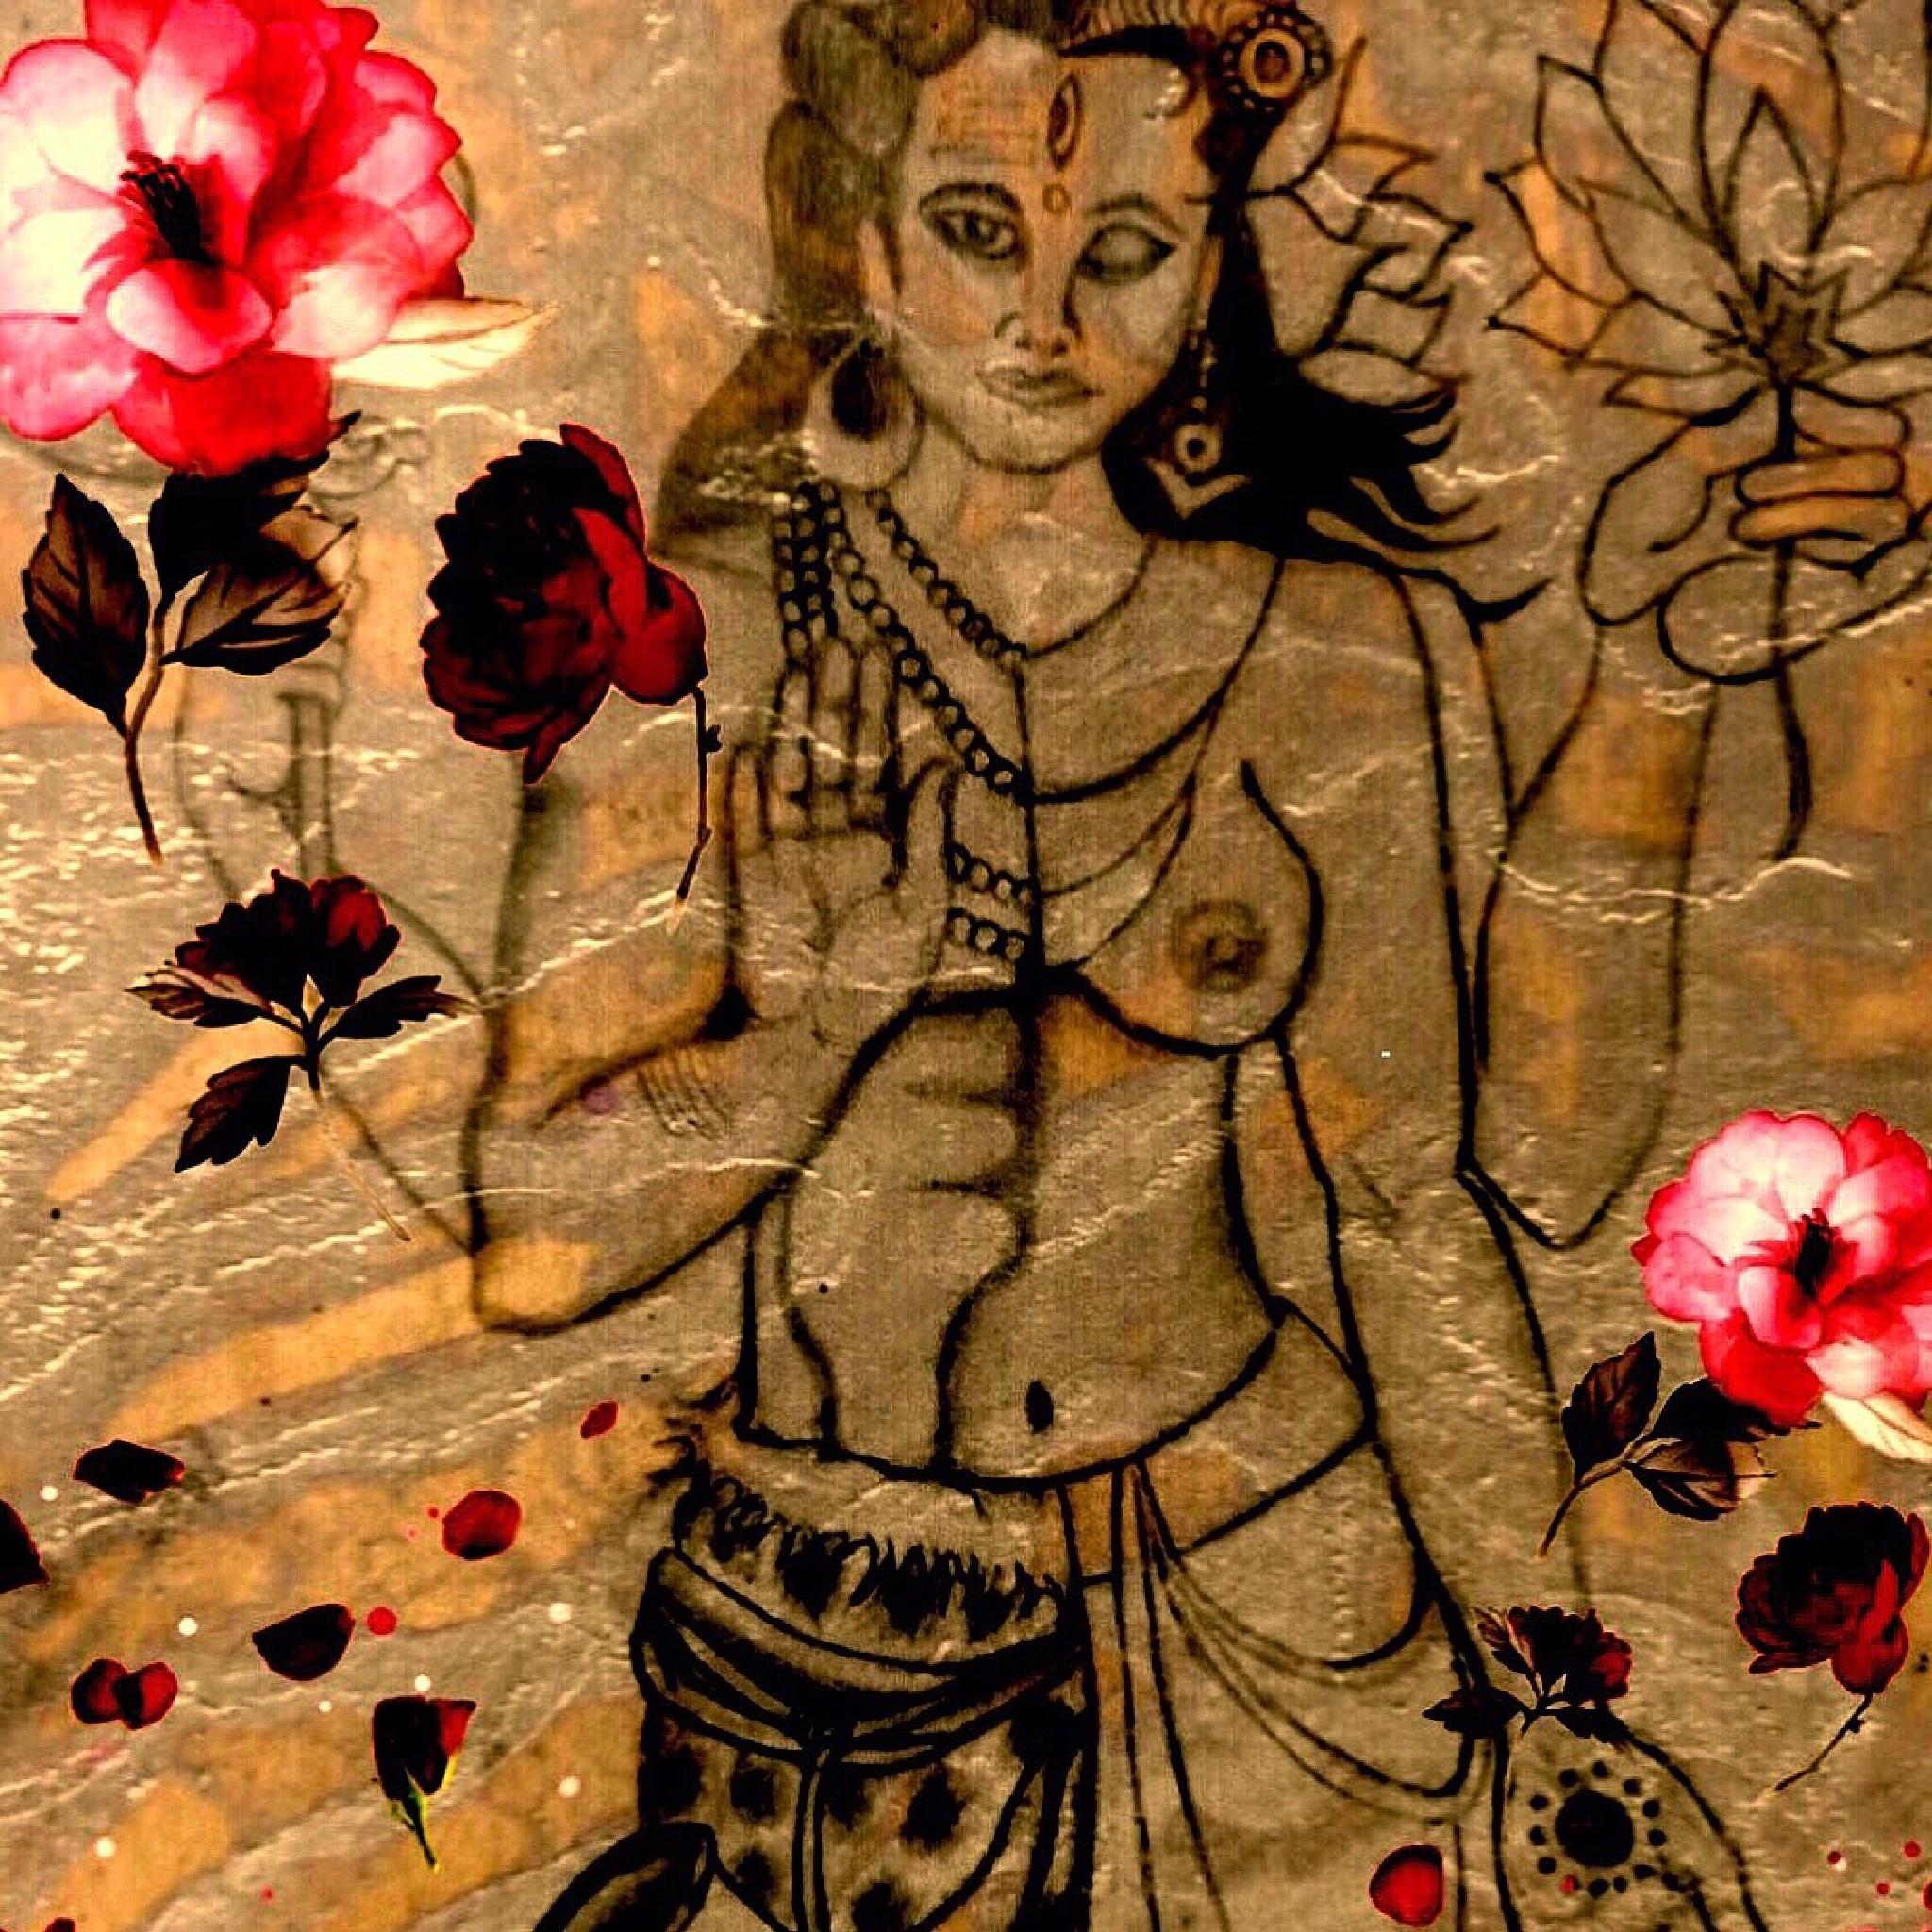 Hermaphrodite Deity  by Devin Cherubini